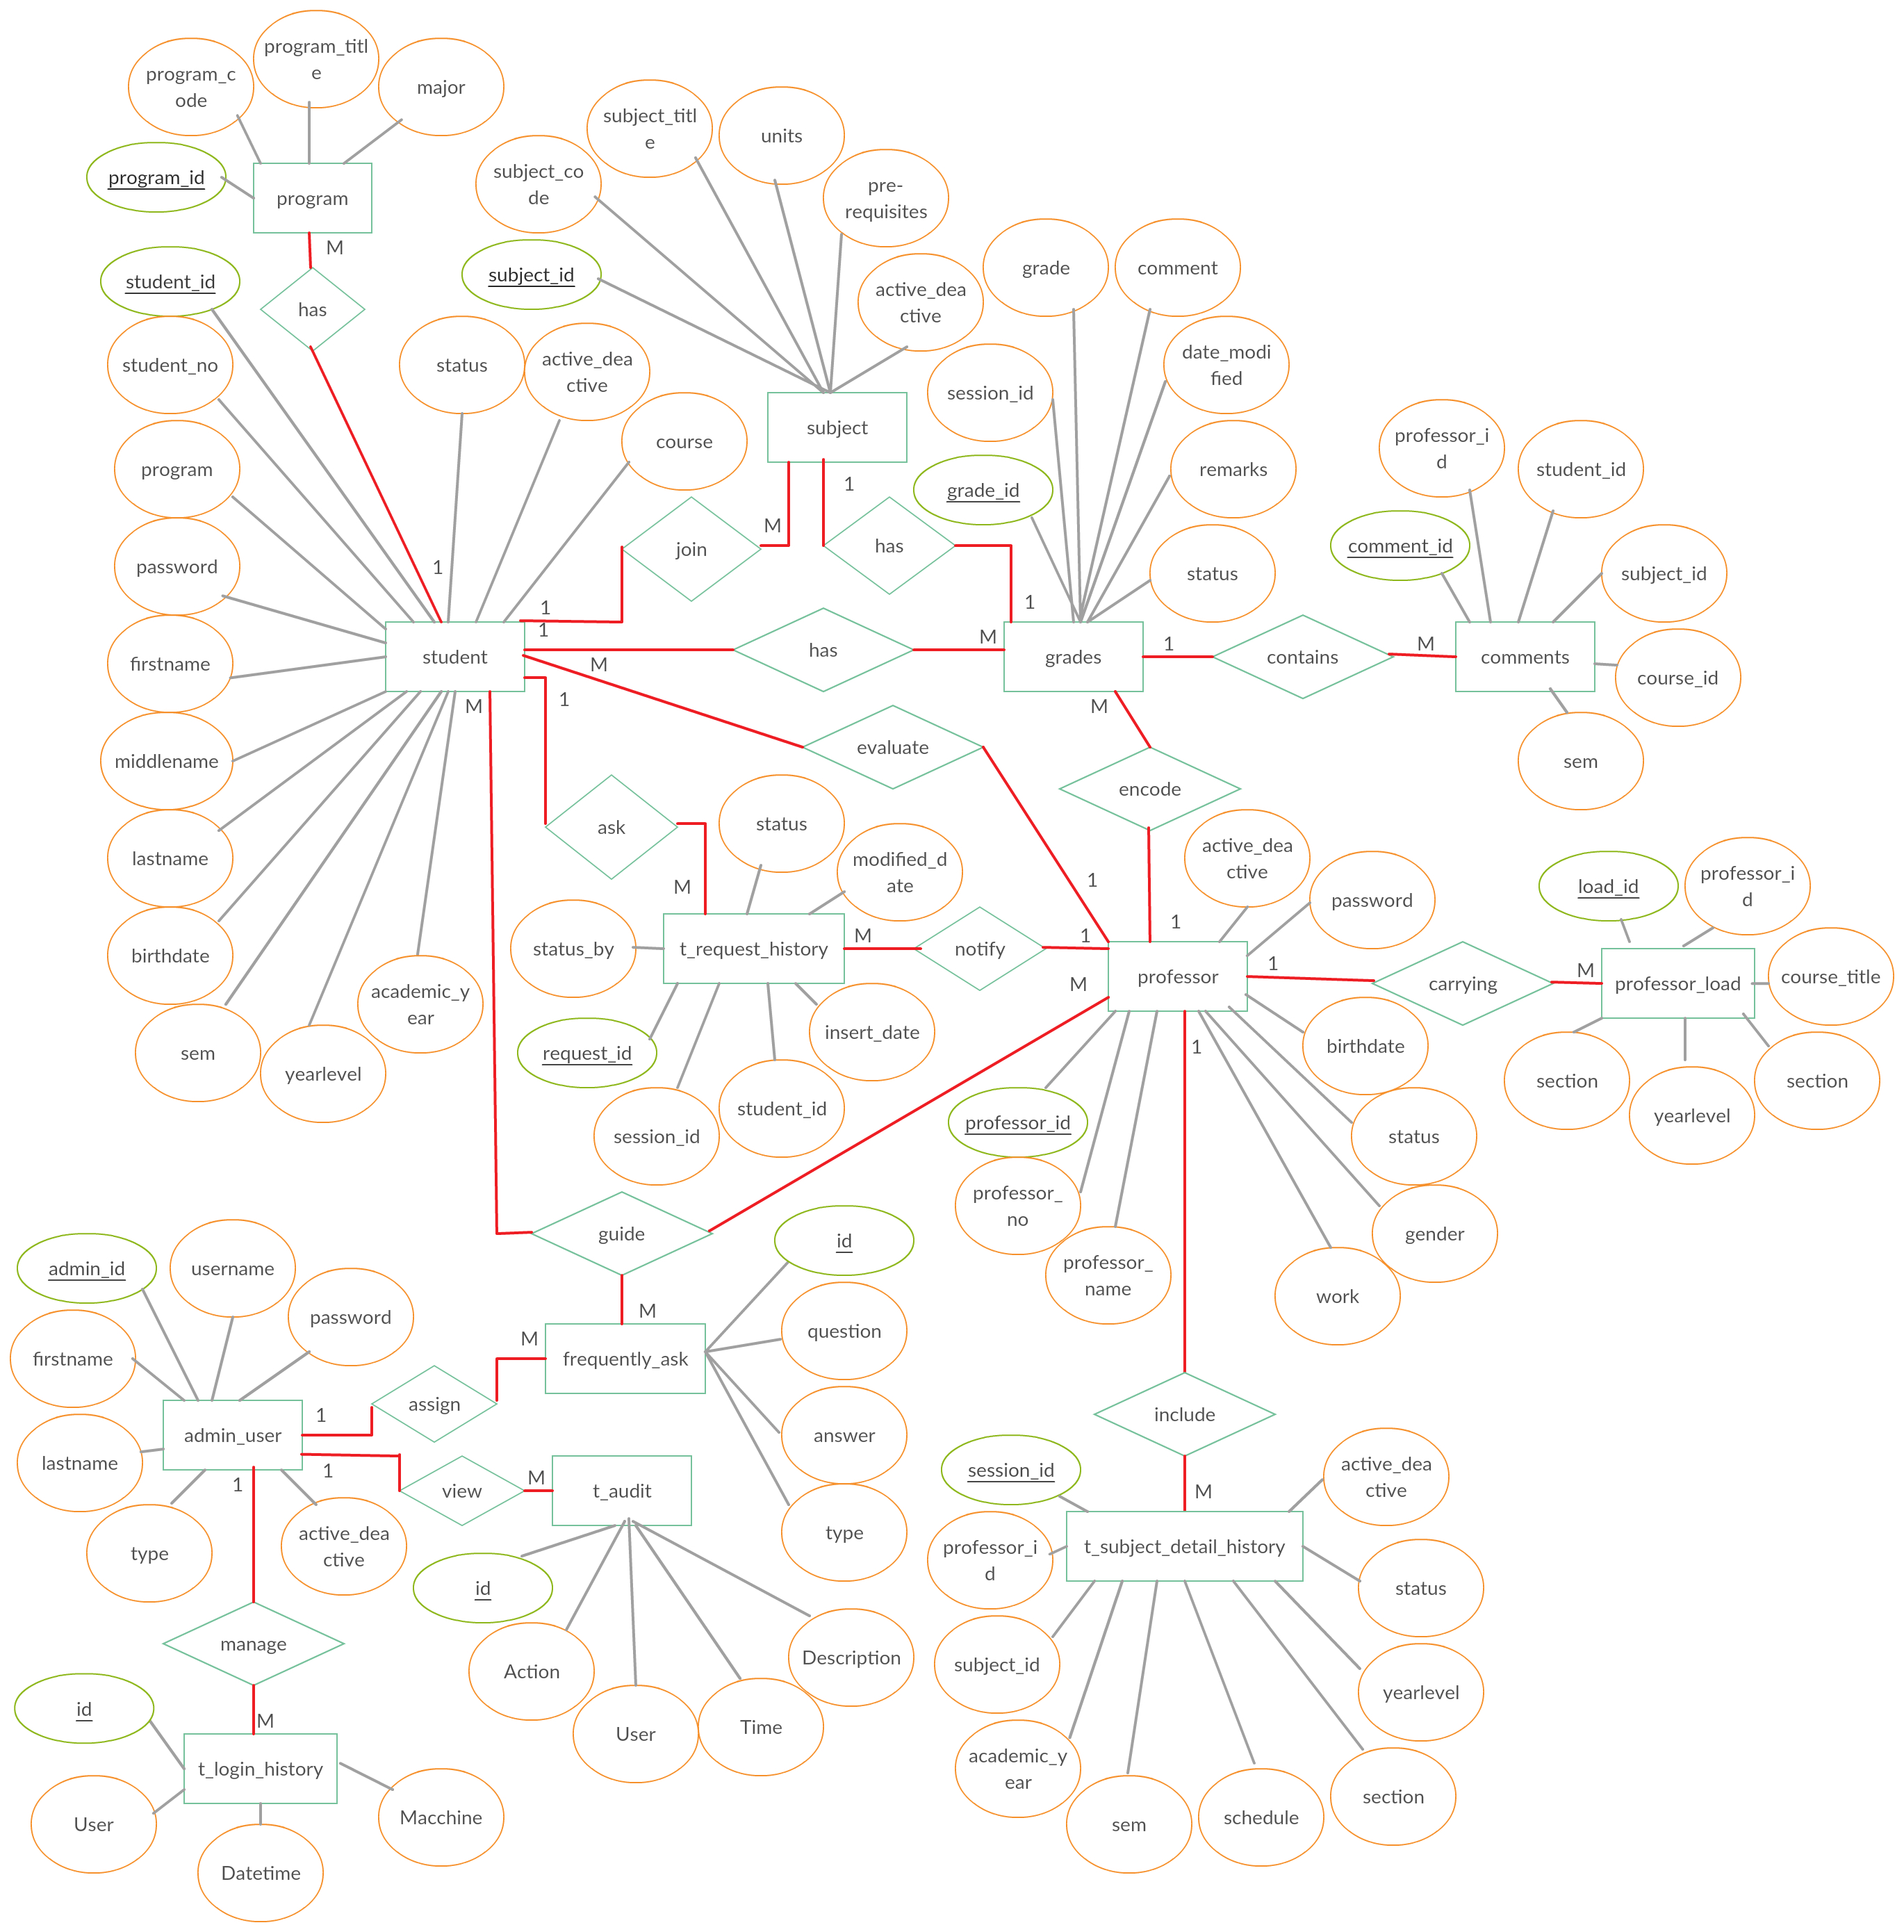 Entity Relationship Diagram (Er Diagram) Of Online Student inside Er Diagram Relationship Symbols